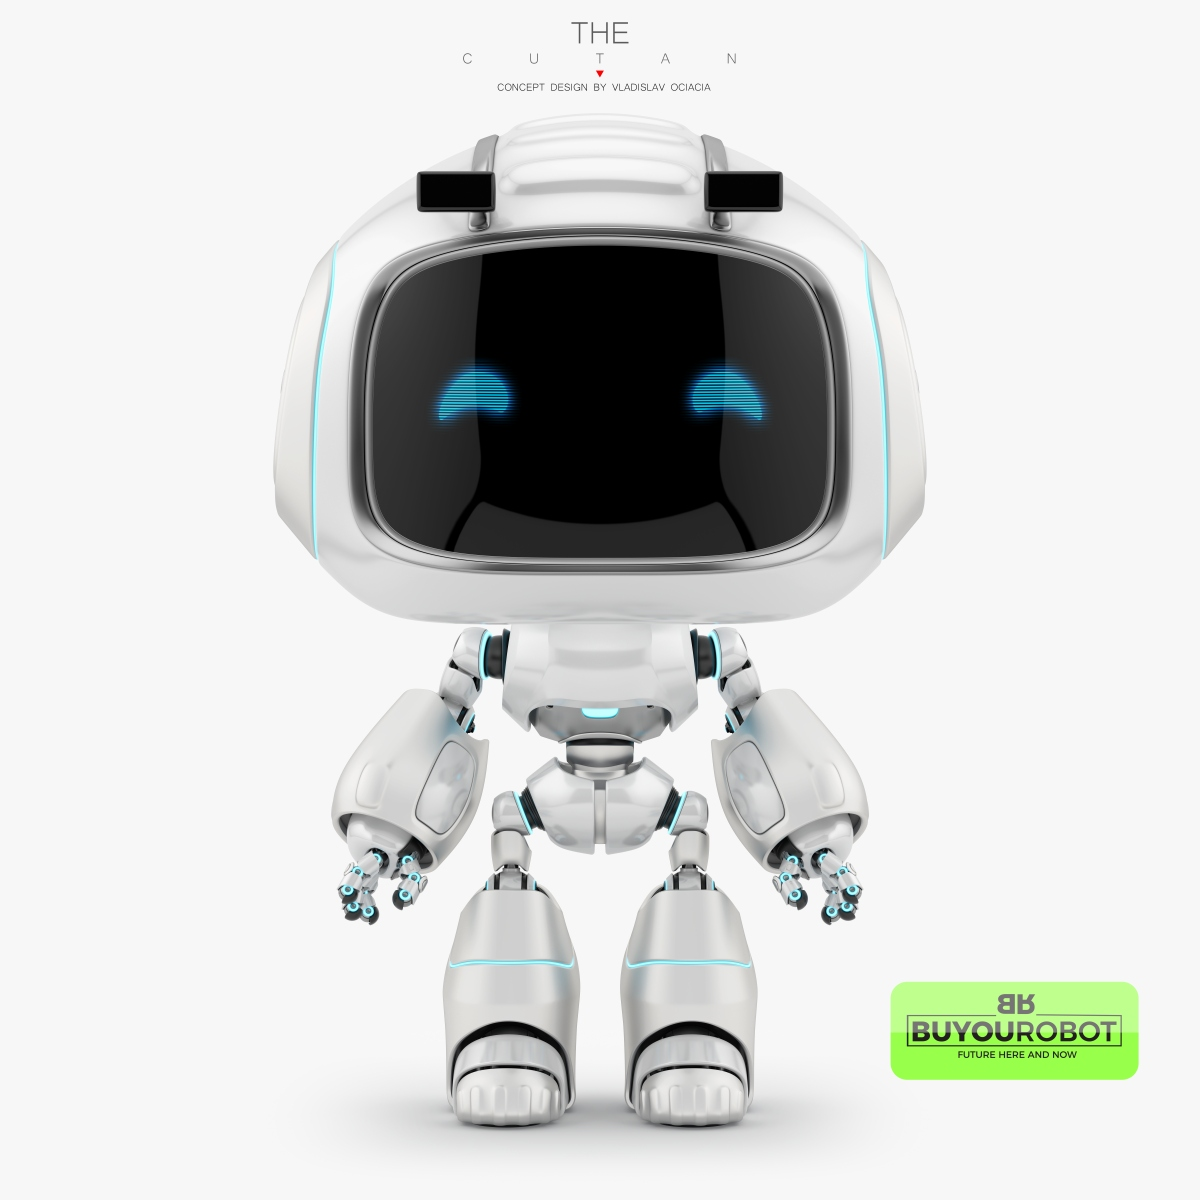 CUTAN VII Robot 3d Model • Buyourobot